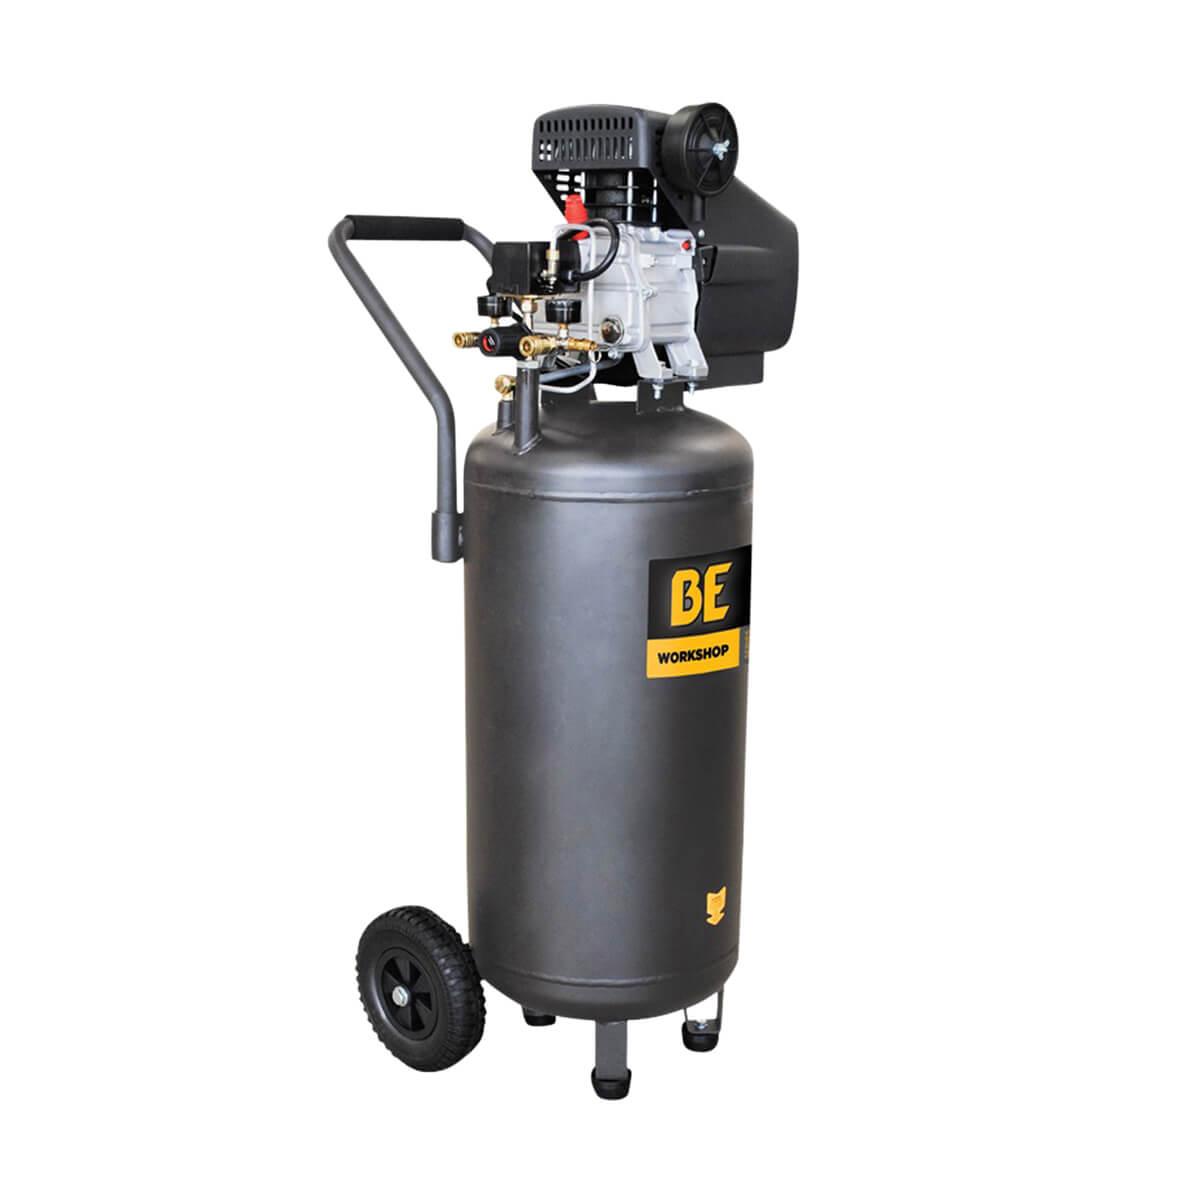 20 Gallon Vertical Compressor